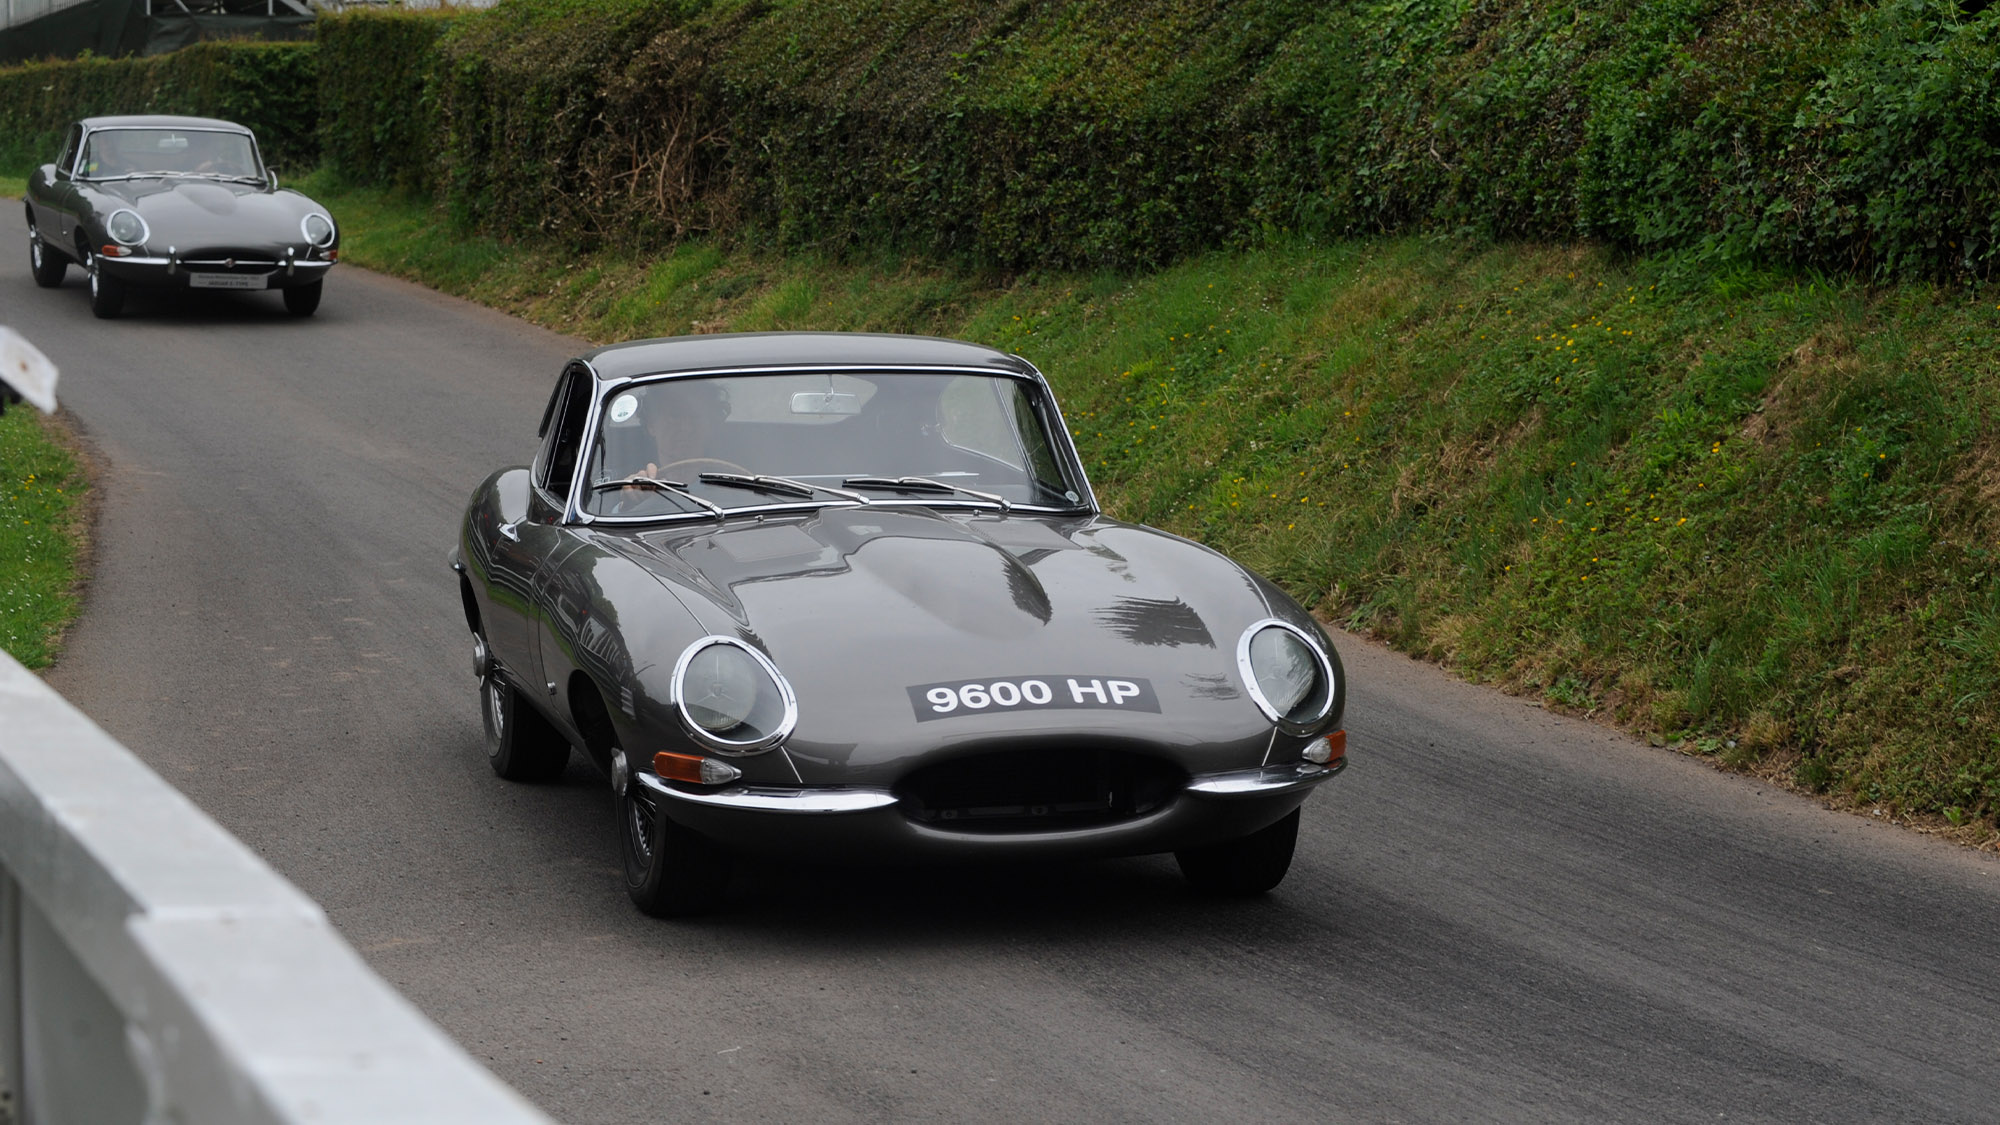 Jaguar E-type 9600 HP at Shelsley Walsh